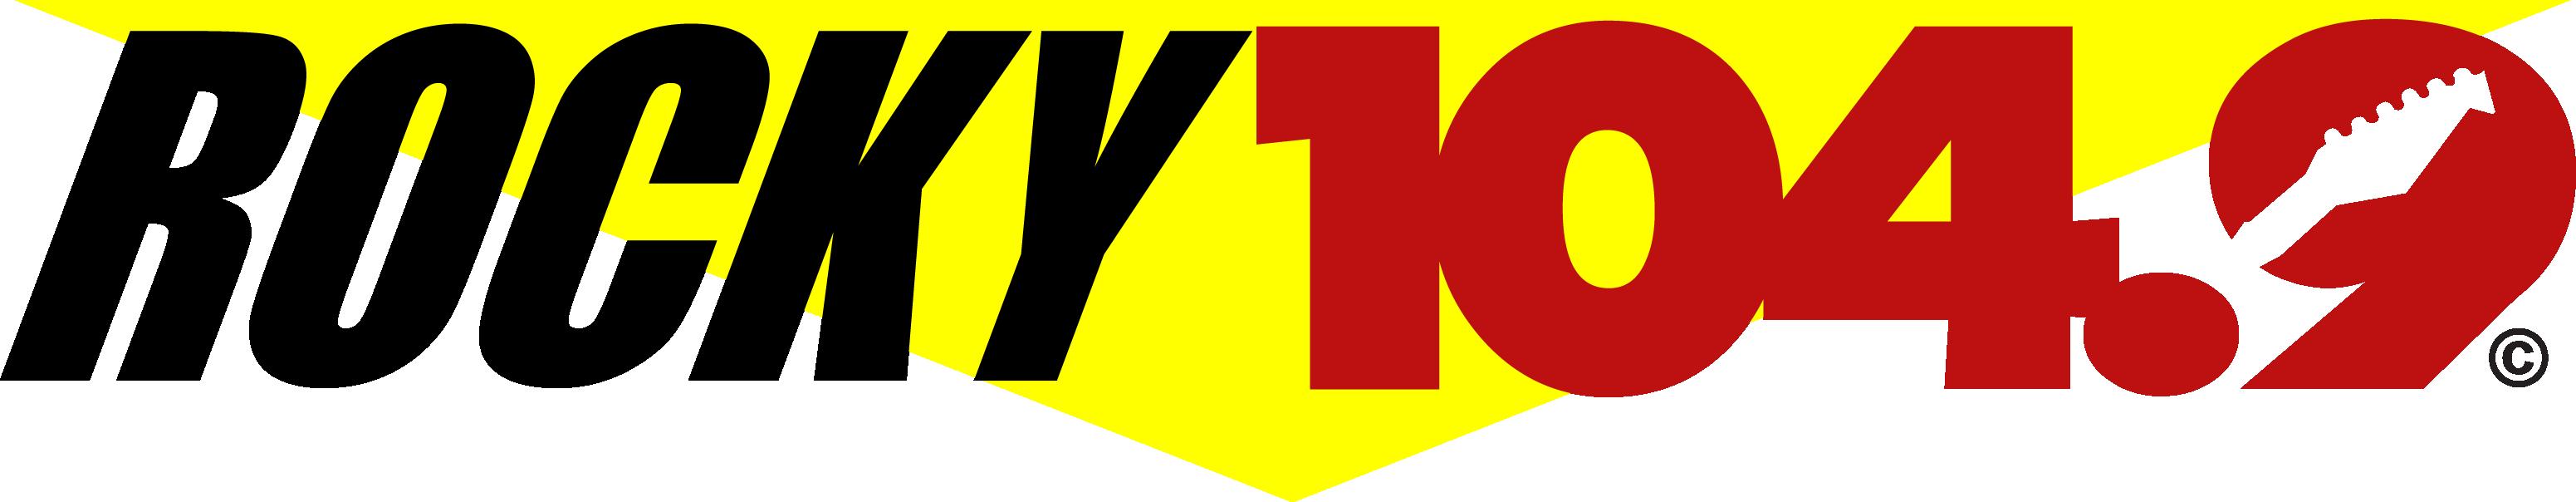 rocky1049